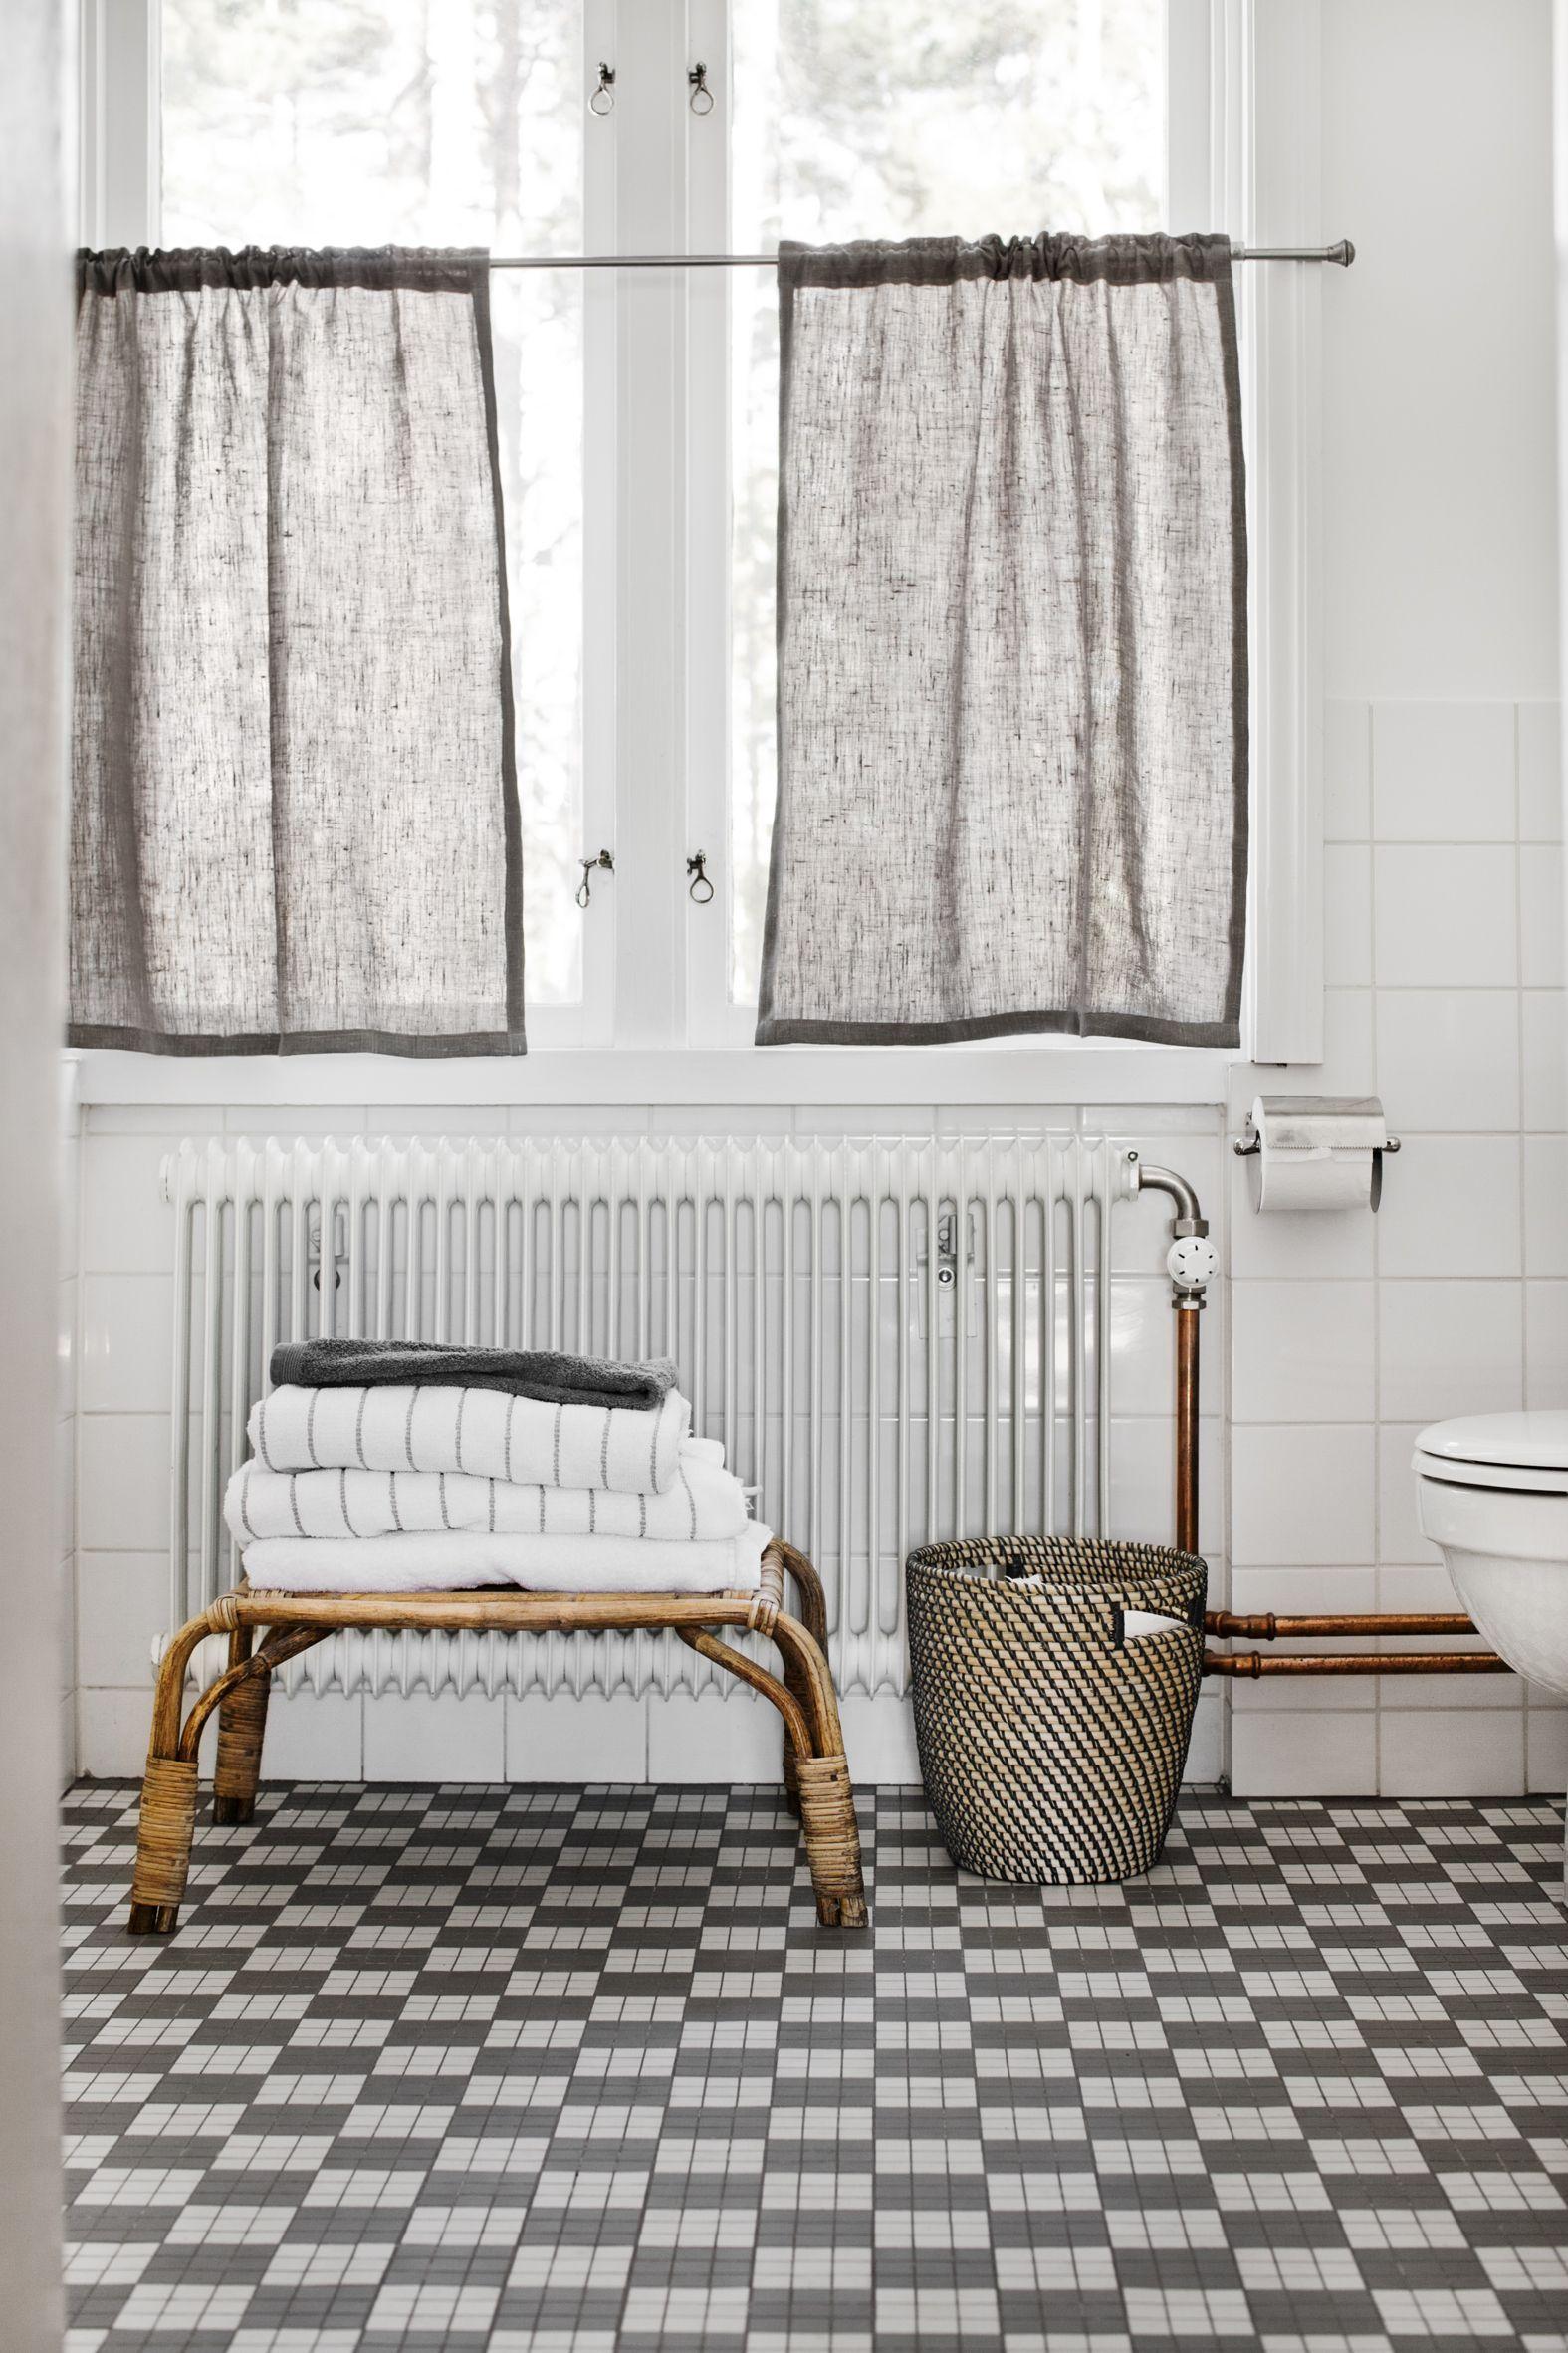 refreshed old bathroom | Bathroom | Pinterest | Bath, Interiors and ...